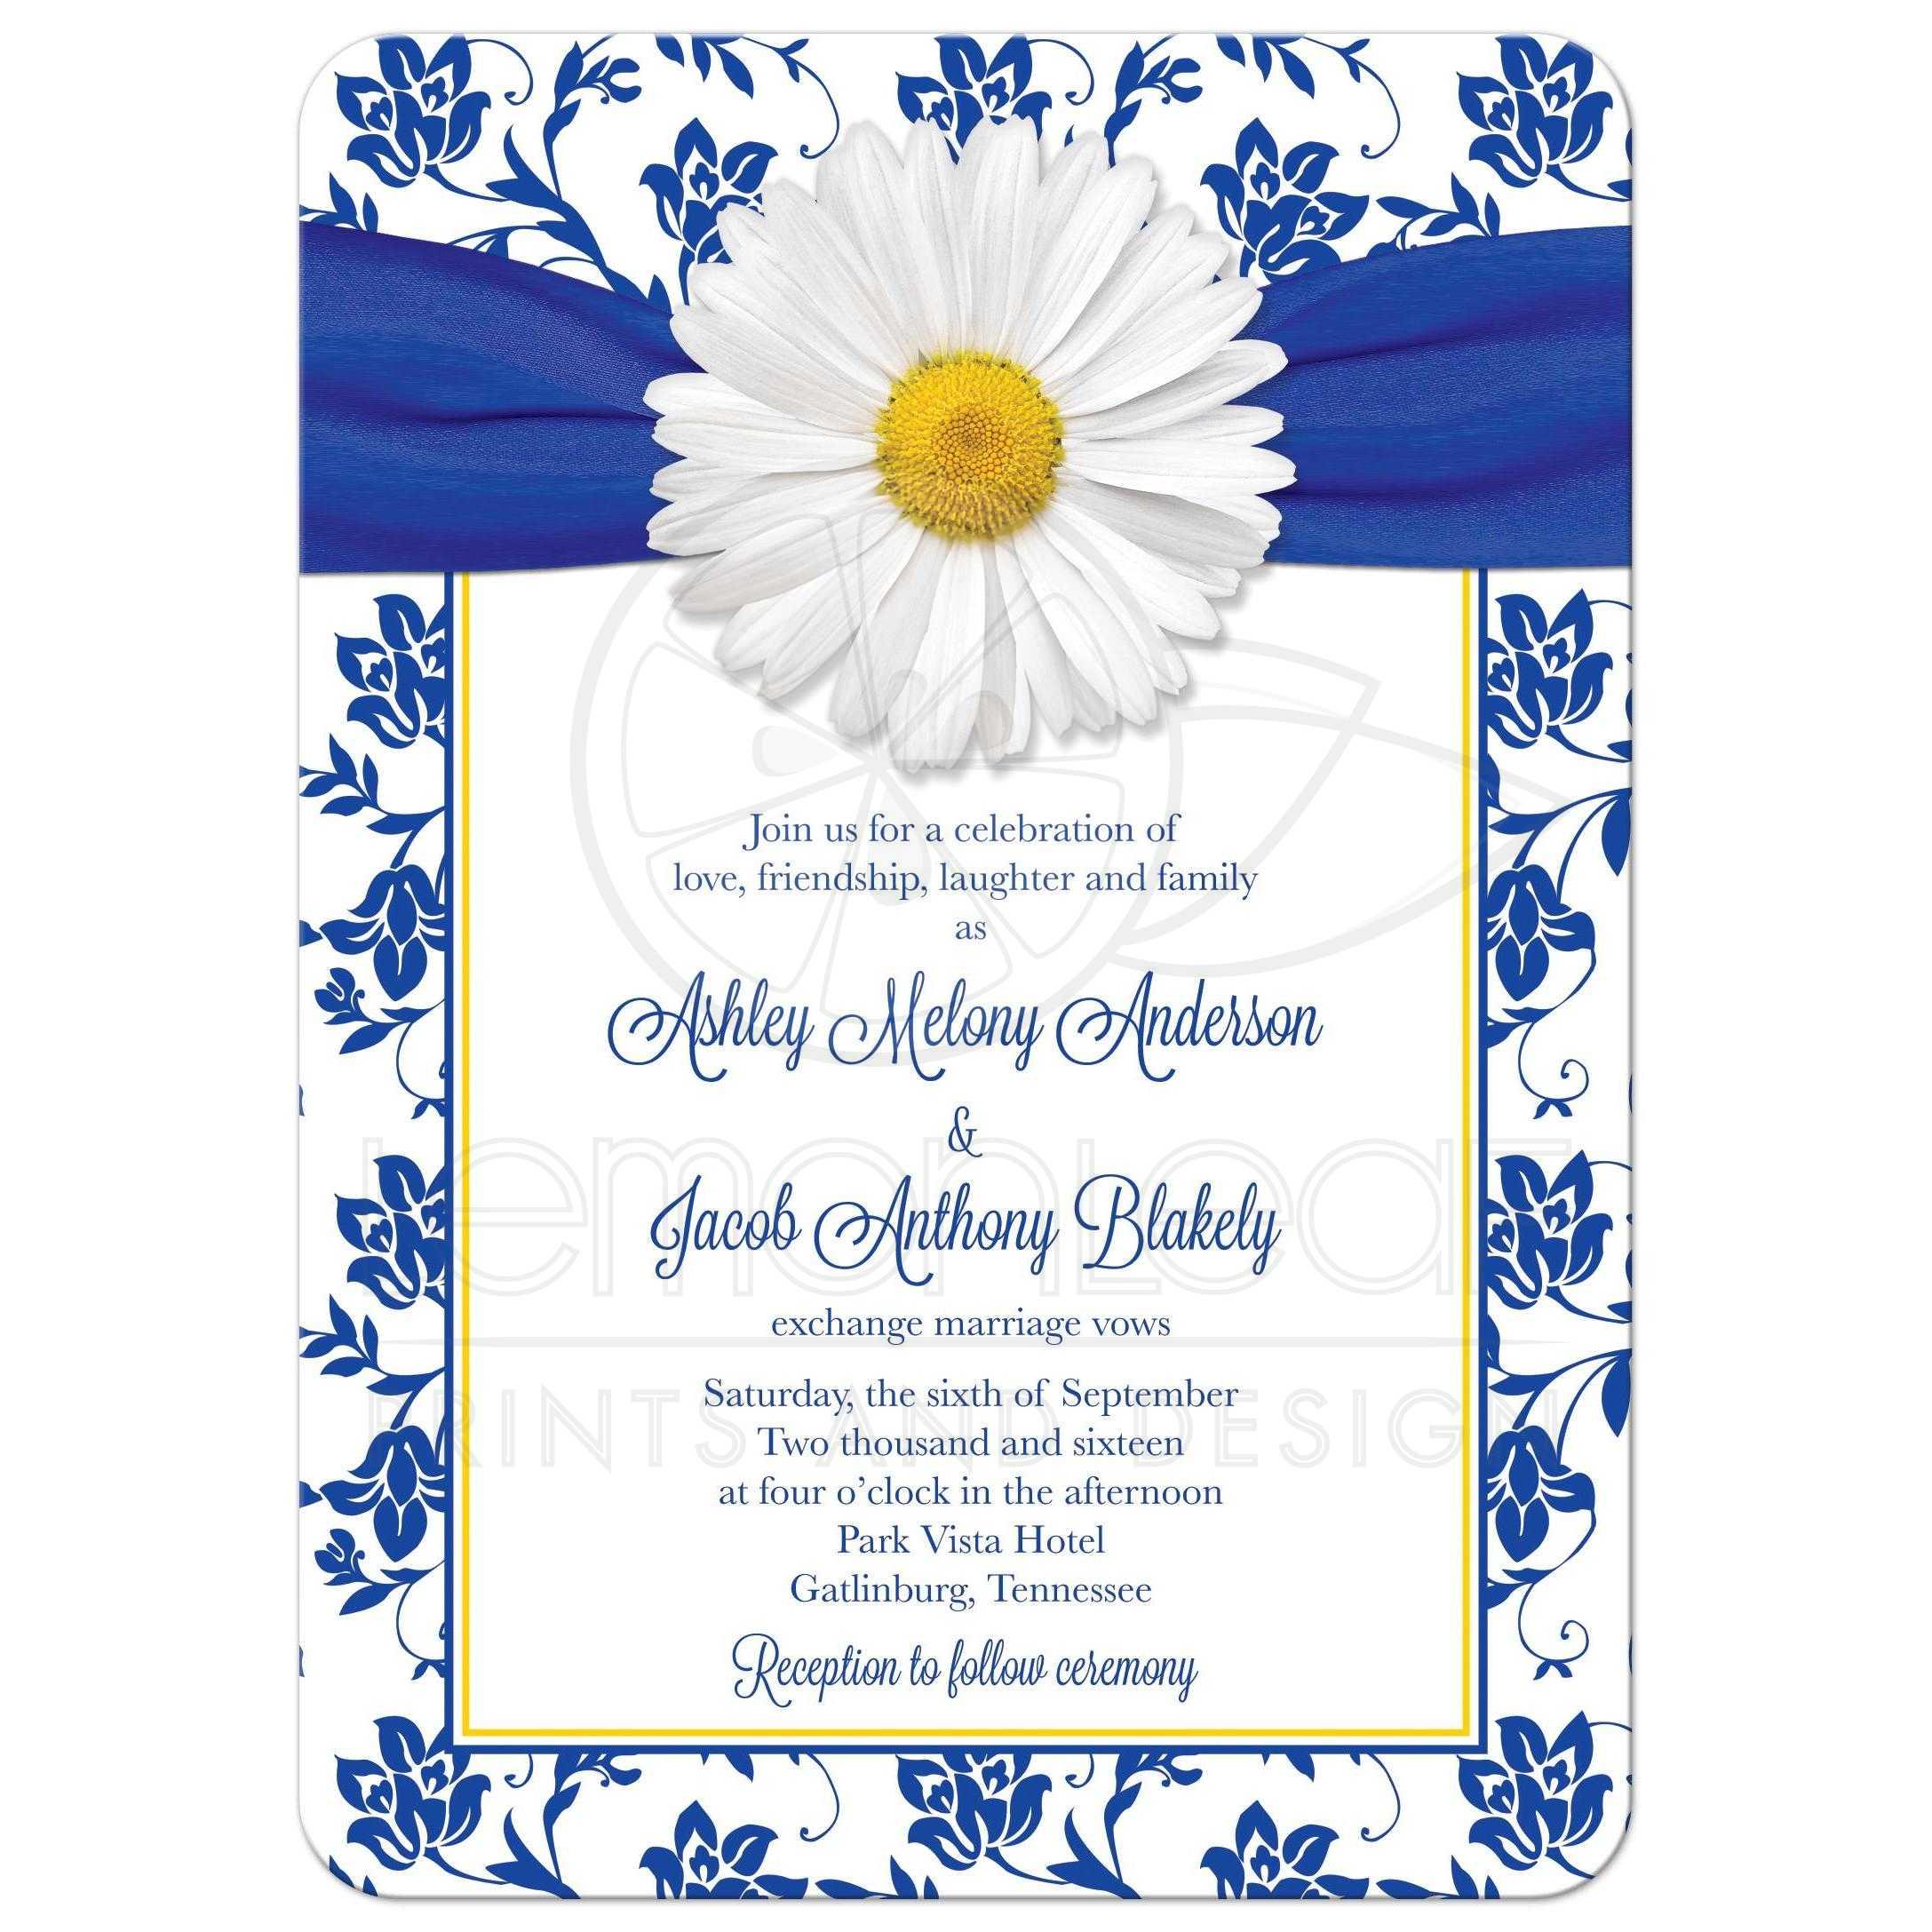 Daisy Wedding Invitation Royal Blue Floral Damask Ribbon